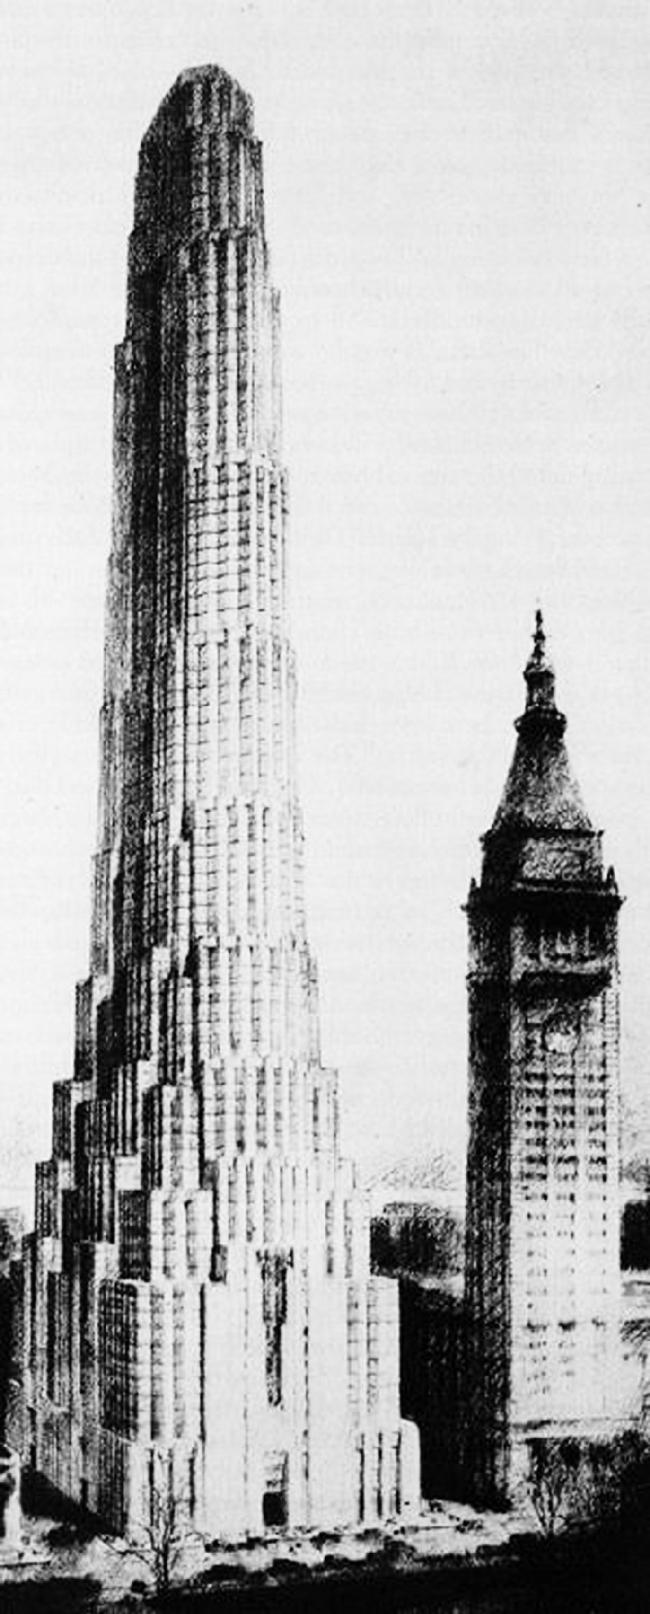 19. Проект Метрополитен Лайф Иншуренс Компани, Х. Корбетт, с 1928